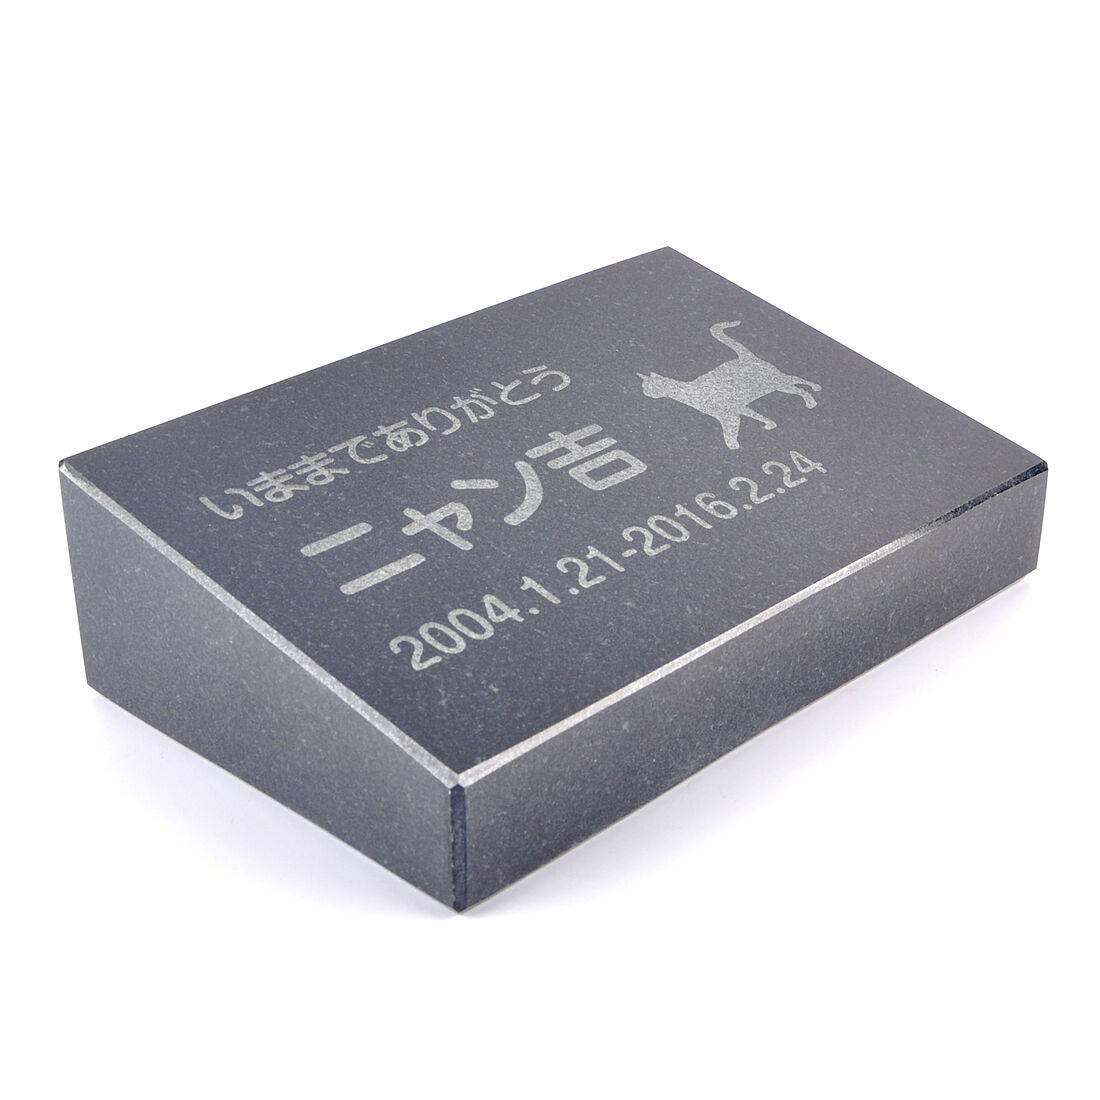 Pet&Love. ペットのお墓 天然石製 立体型 御影石 ブラック プレーン スタンダード 200x130mm   【HLS_DU】【RCP】【楽ギフ_包装】【楽ギフ_名入れ】 attr202attr ctgr2ctgr sml3sml+ctgr2ctgr CAT